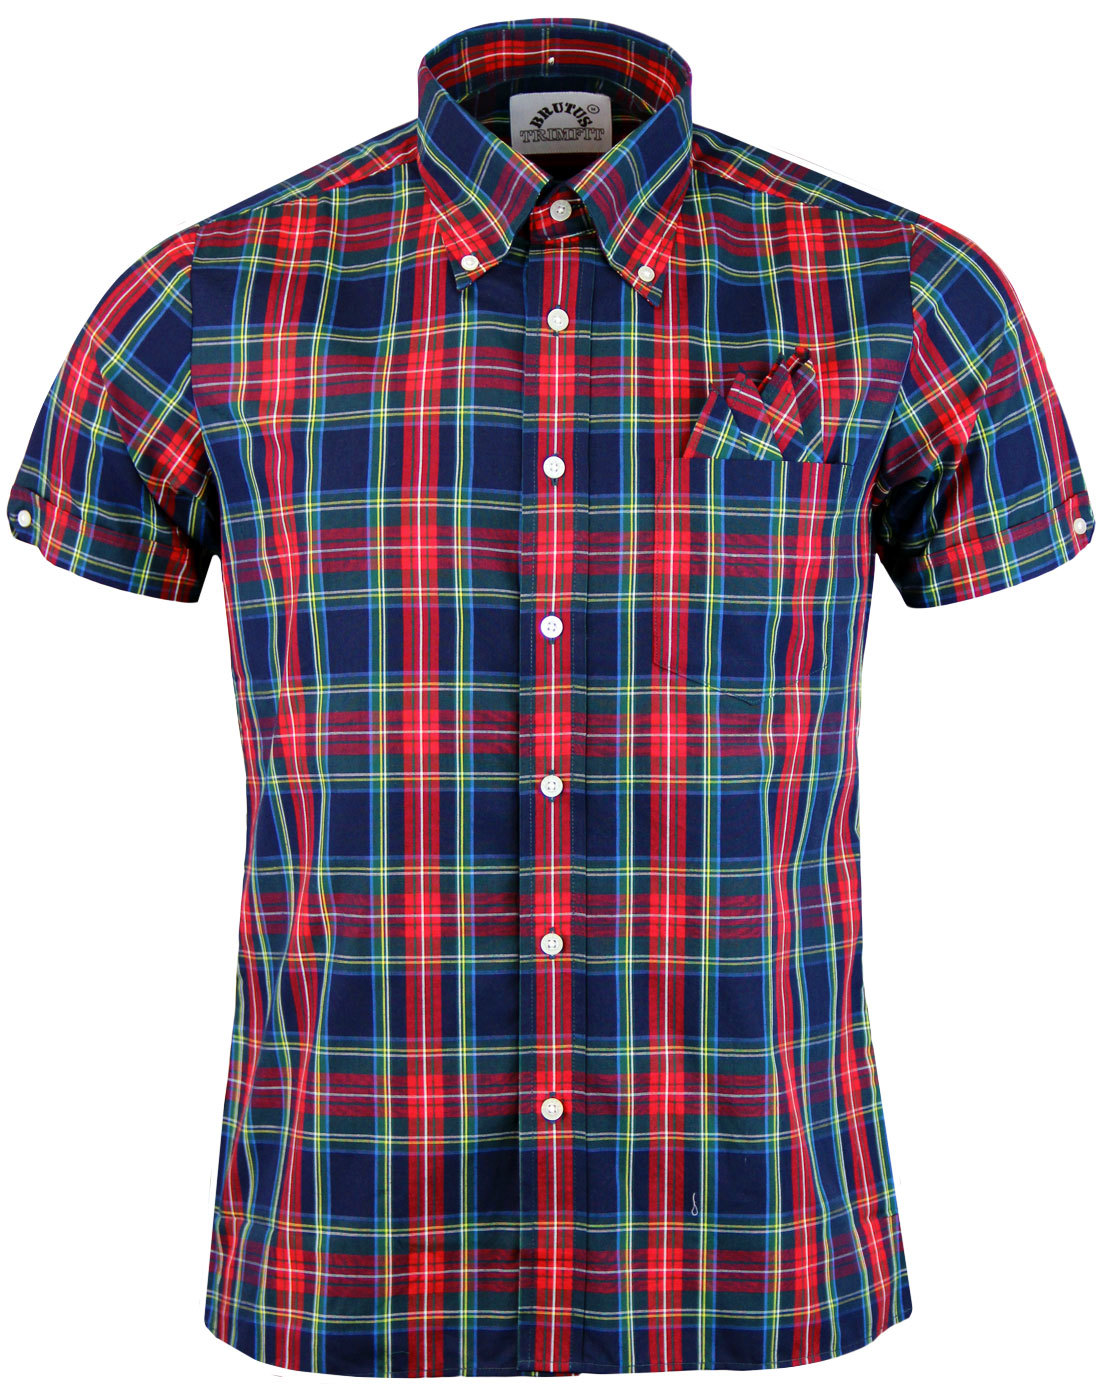 BRUTUS TRIMFIT Heritage Check Retro Mod Shirt NAVY